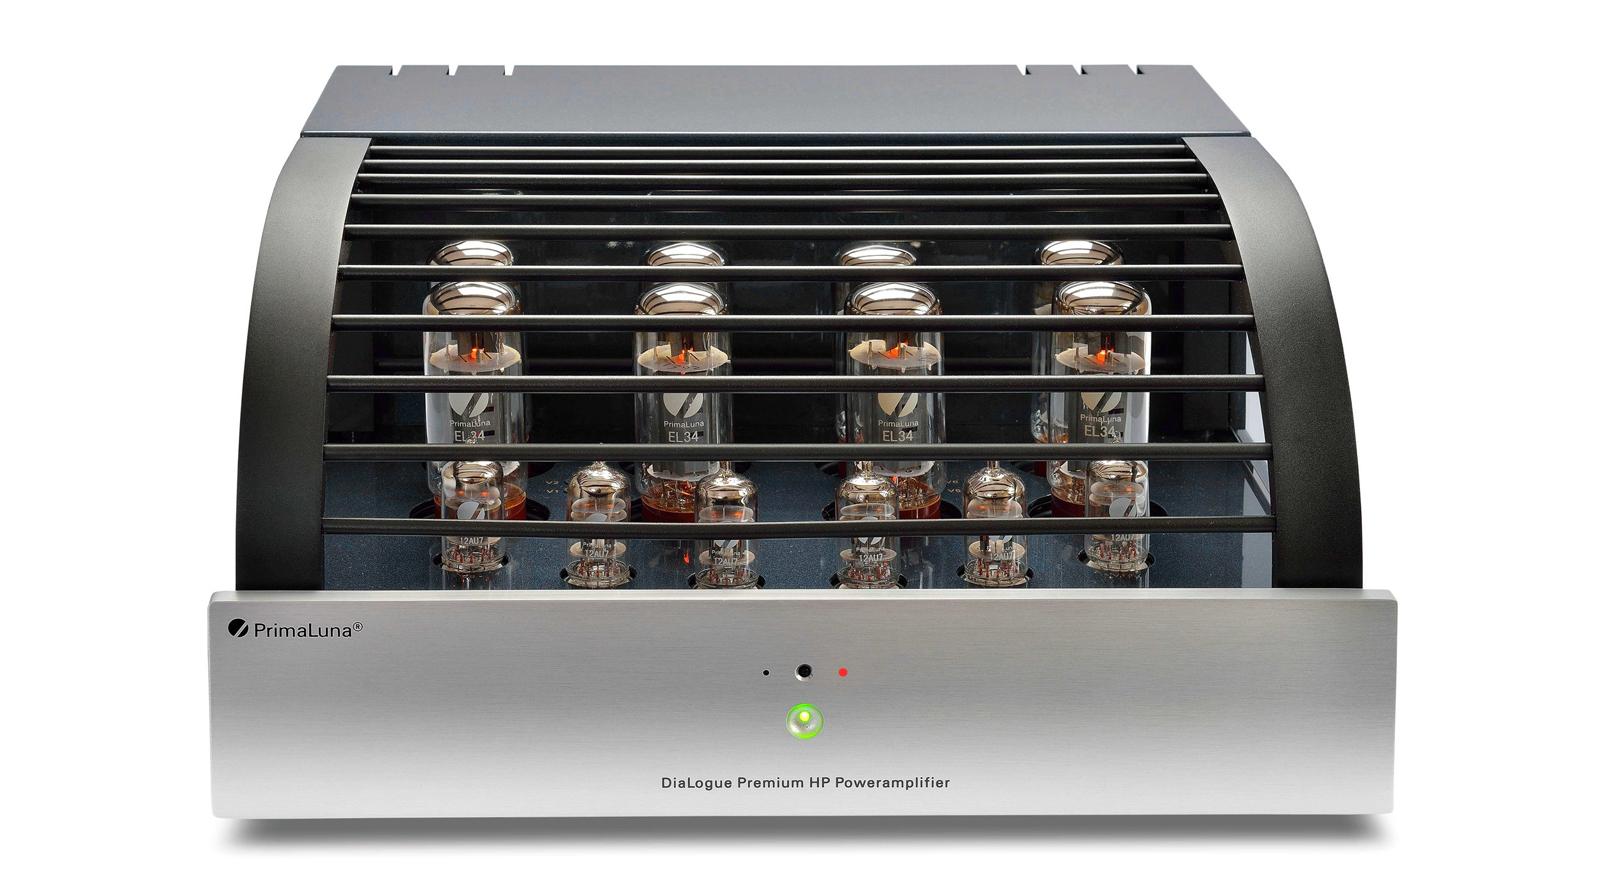 DiaLogue Premium HP Power Amplifier